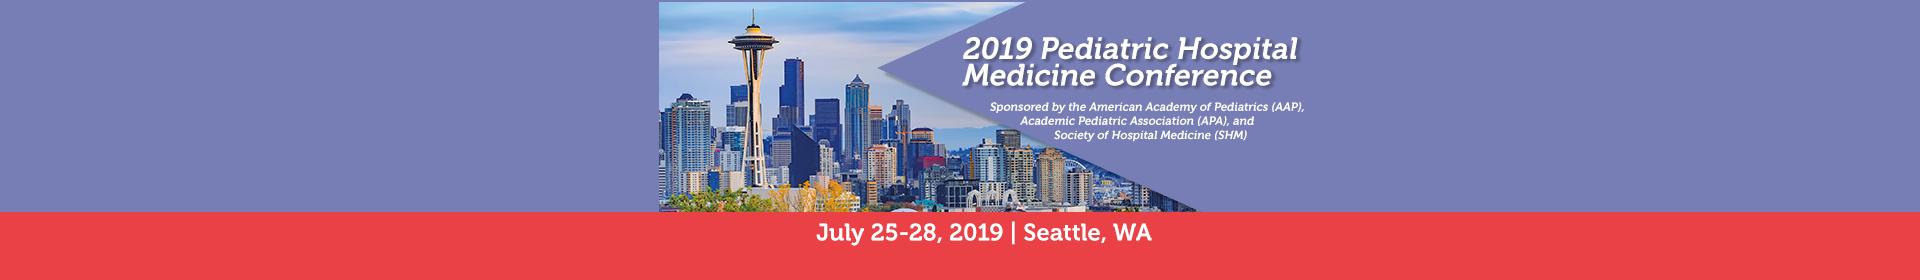 Pediatric Hospital Medicine Conference Event Banner